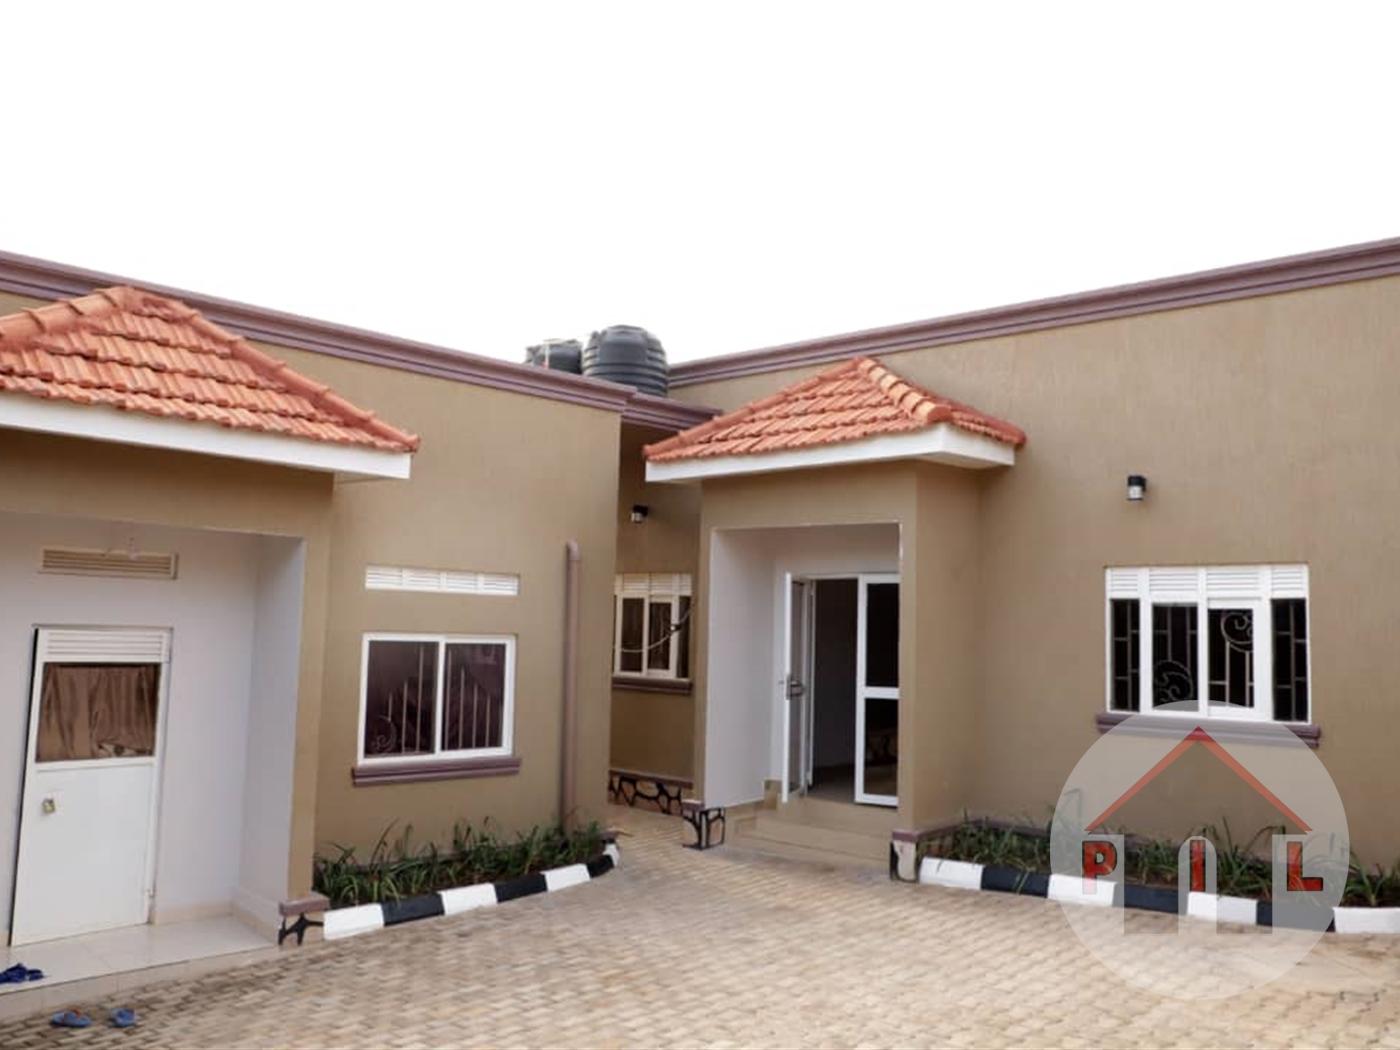 Rental units for sale in Ntinda Wakiso